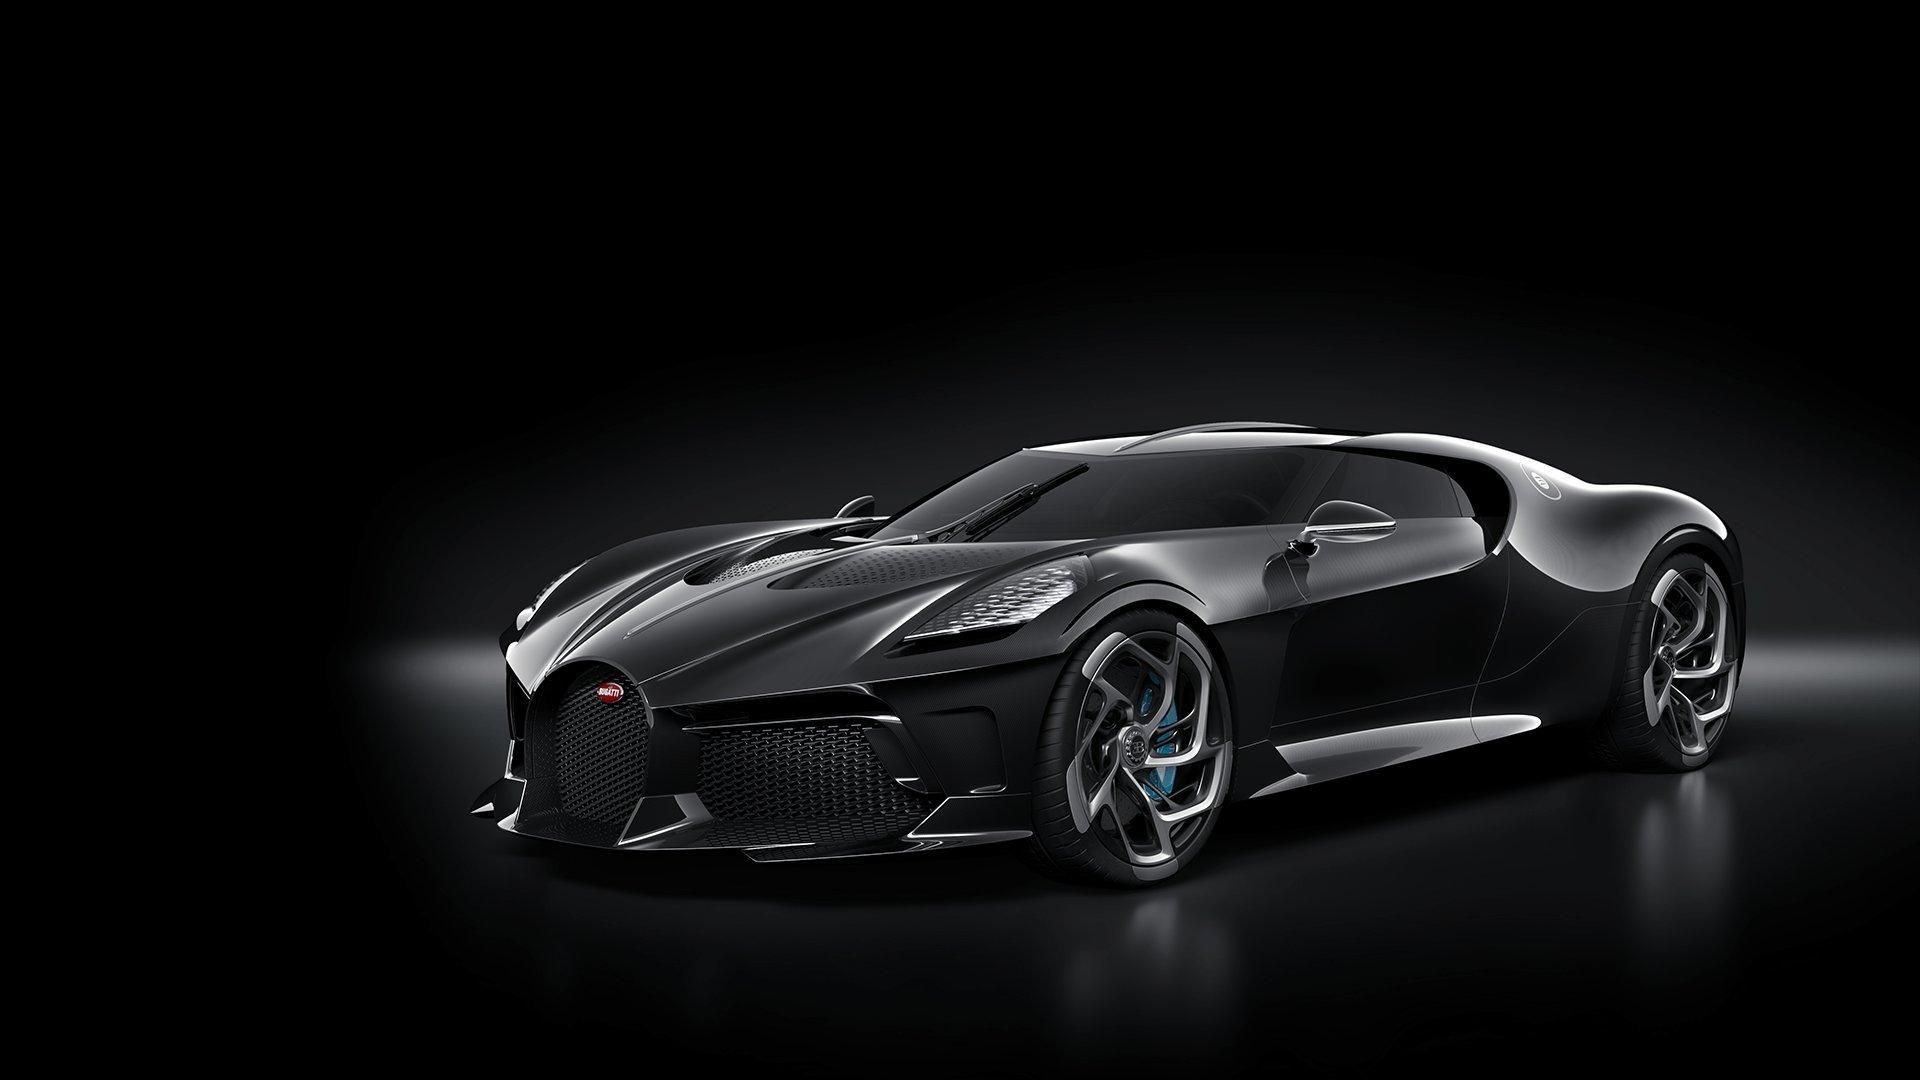 Bugatti Says La Voiture Noire